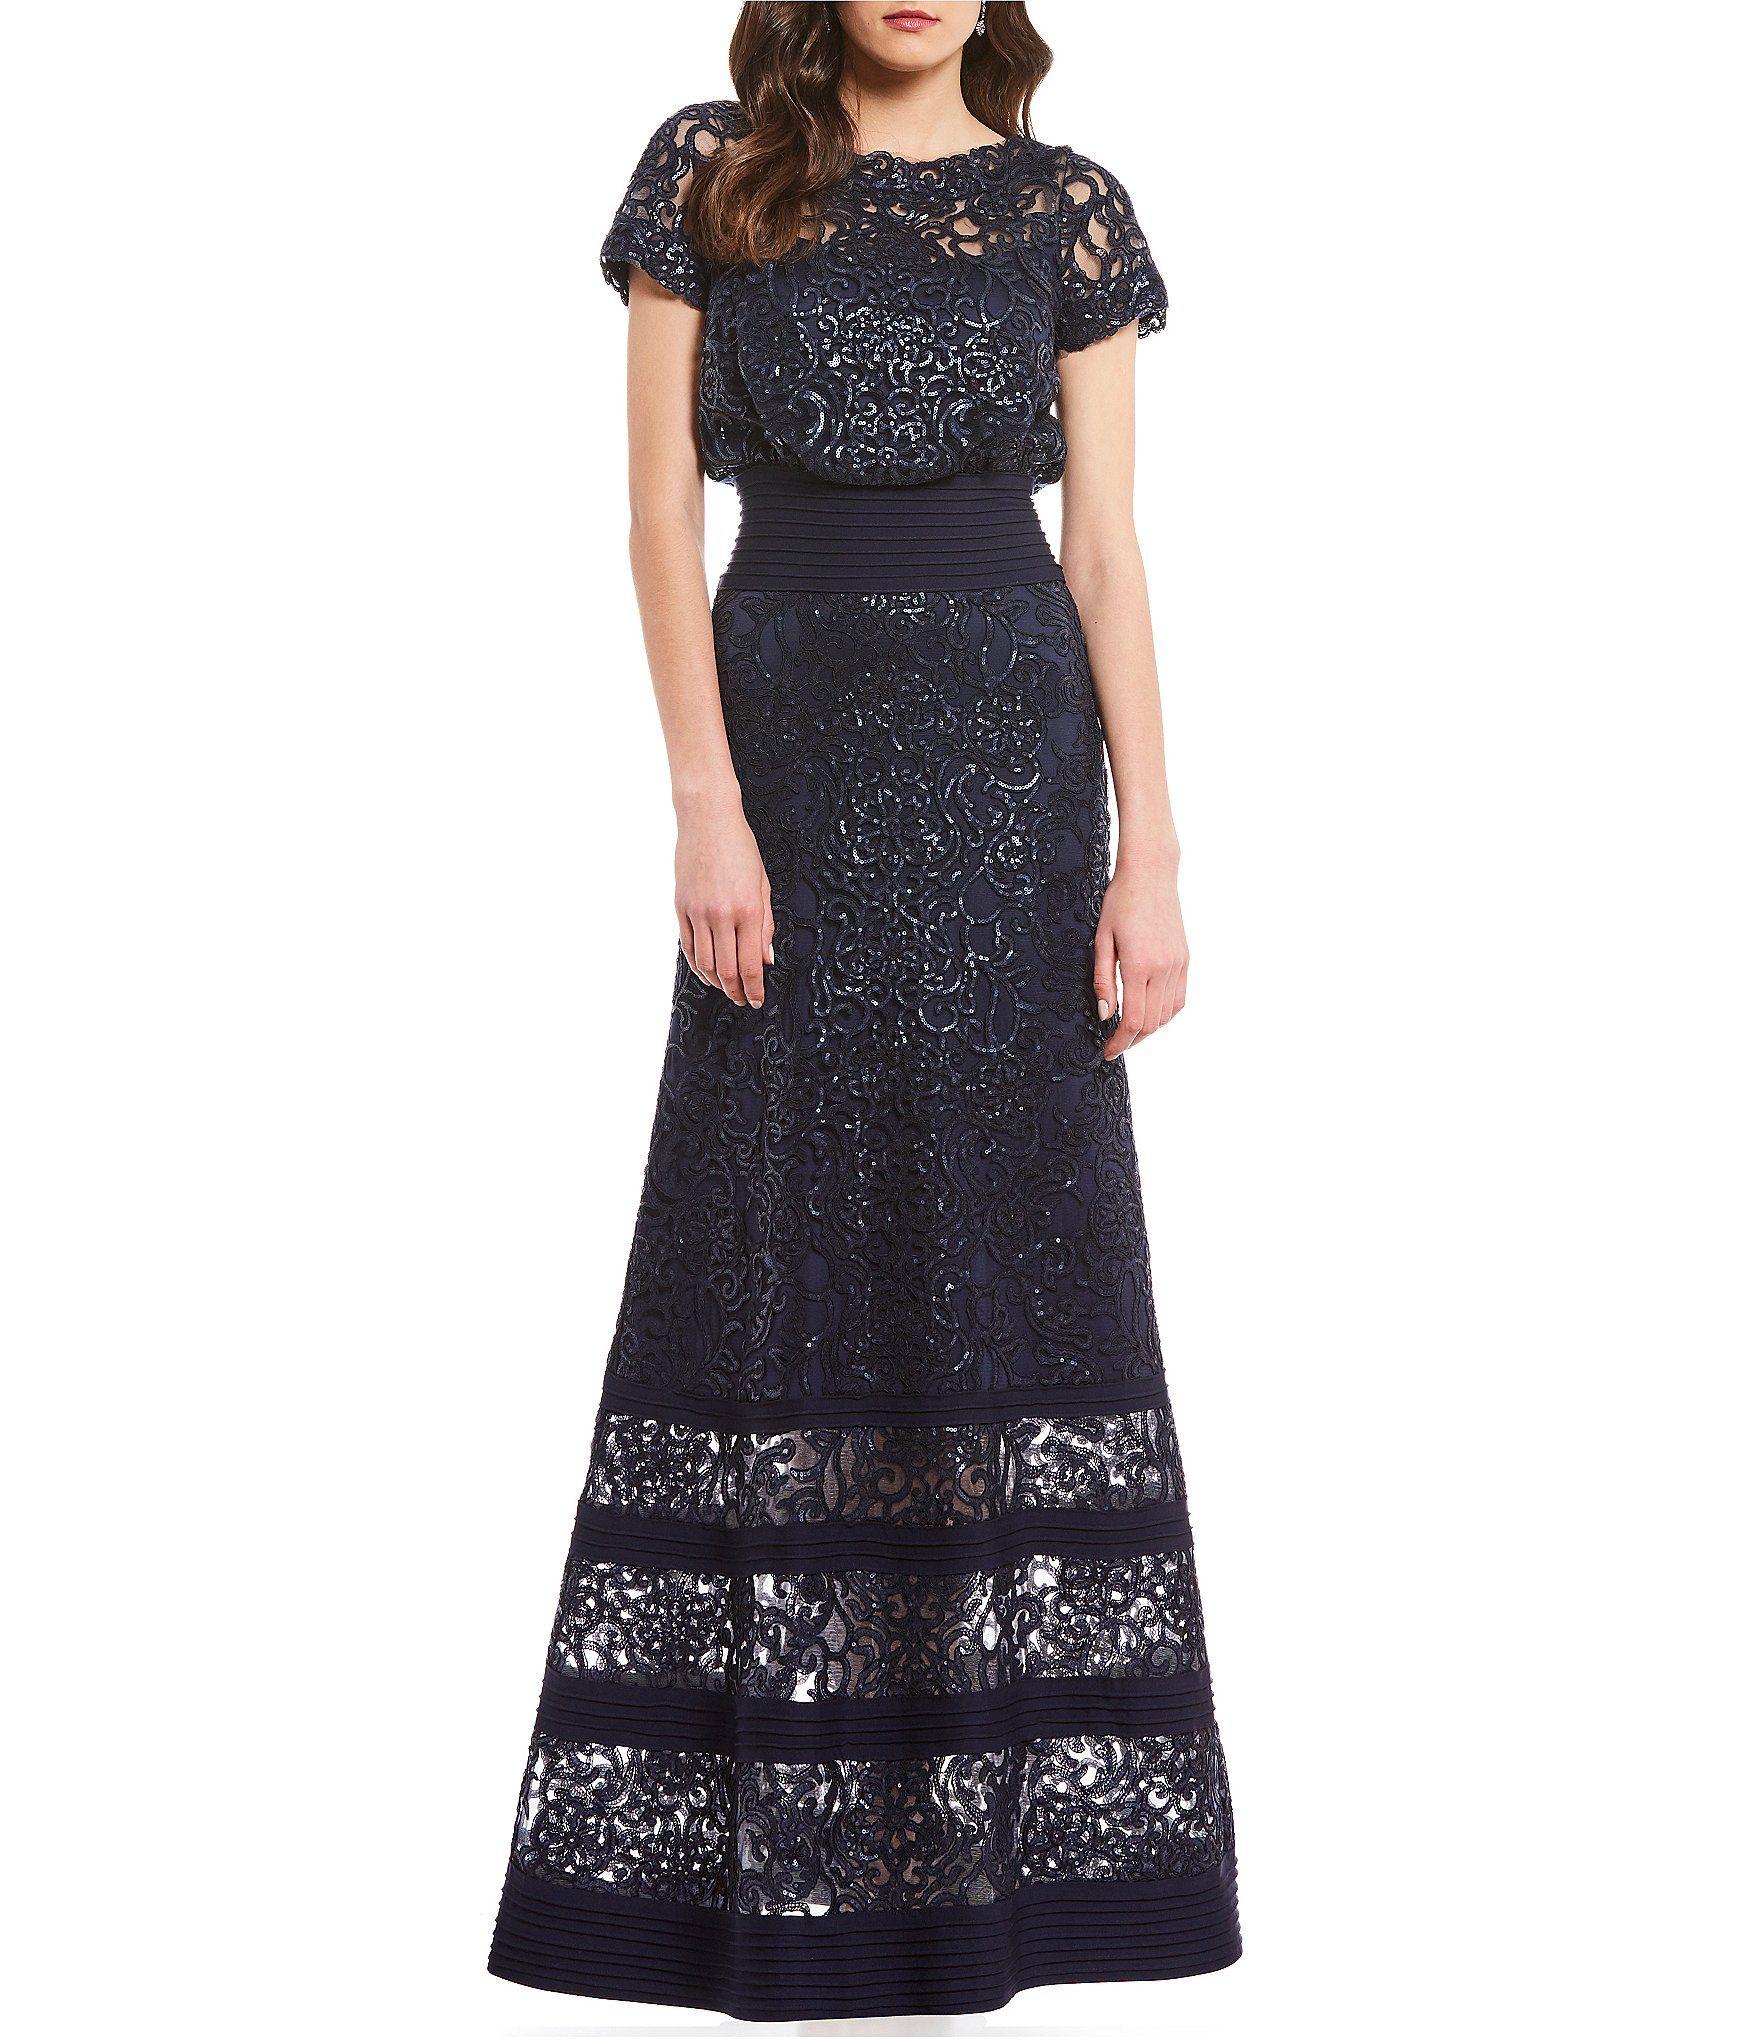 214789580ff Tadashi Shoji Metallic Sequin Lace Blouson Gown  Dillards